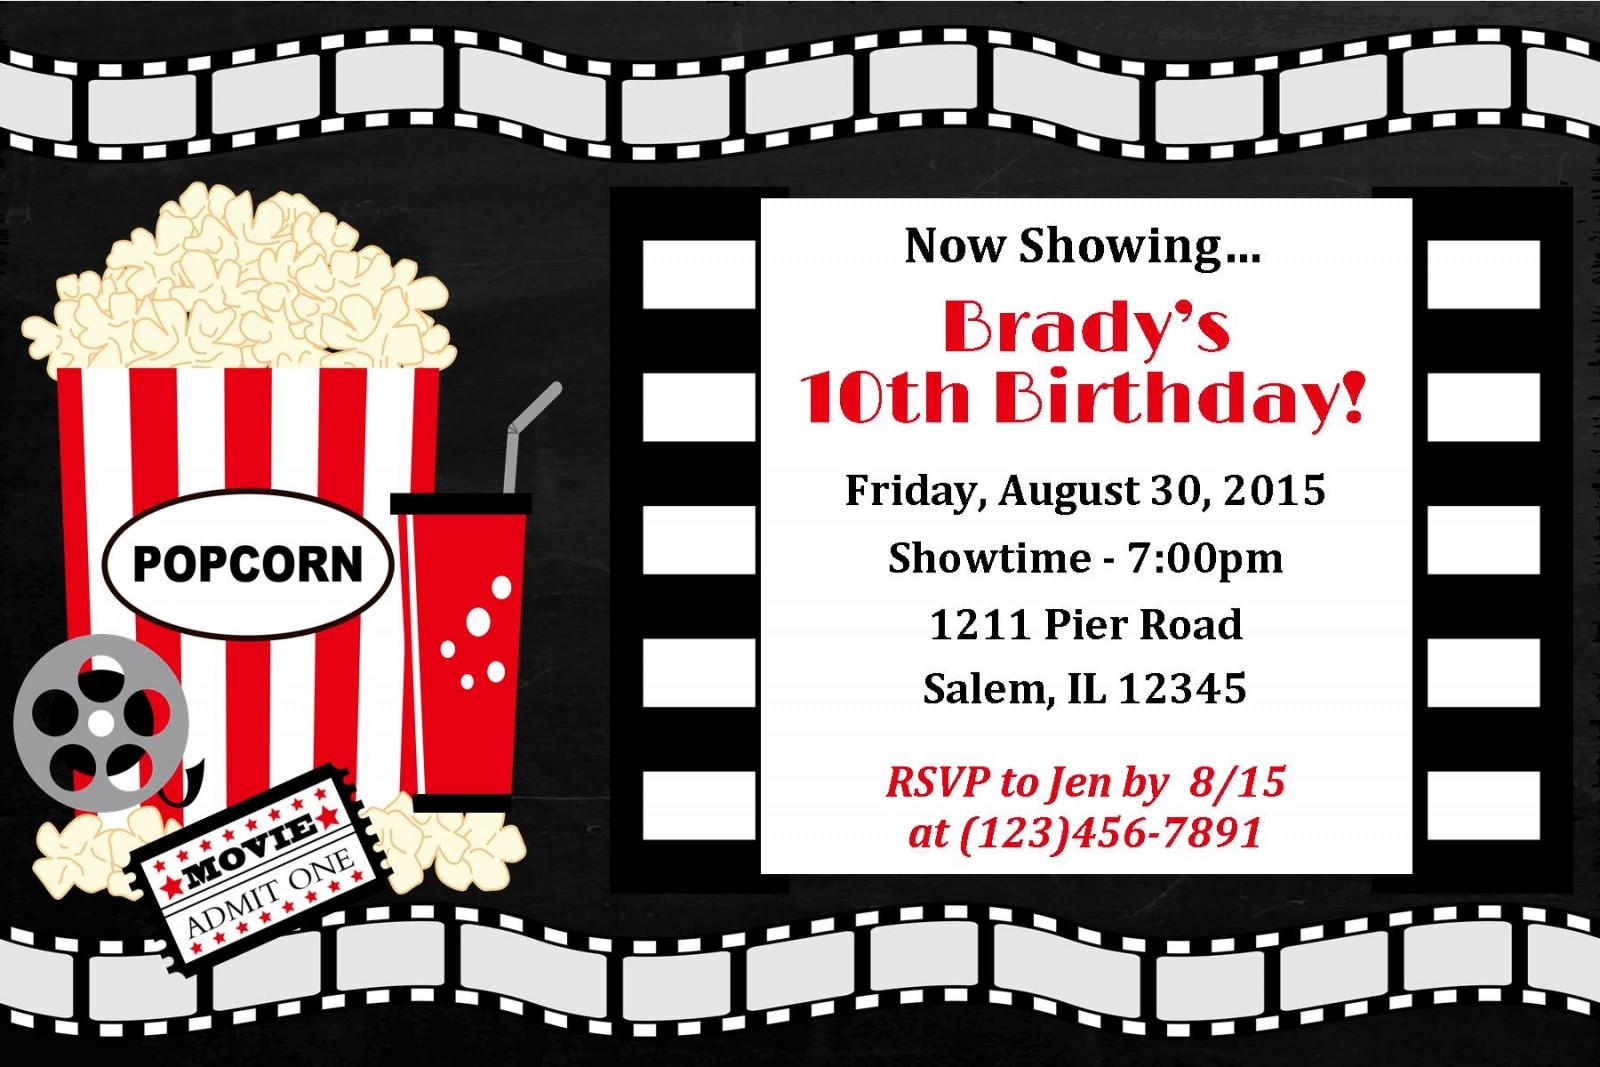 Movie Birthday Party Invitations Printable Free  Movie Night Invitation Movie night birthday movie